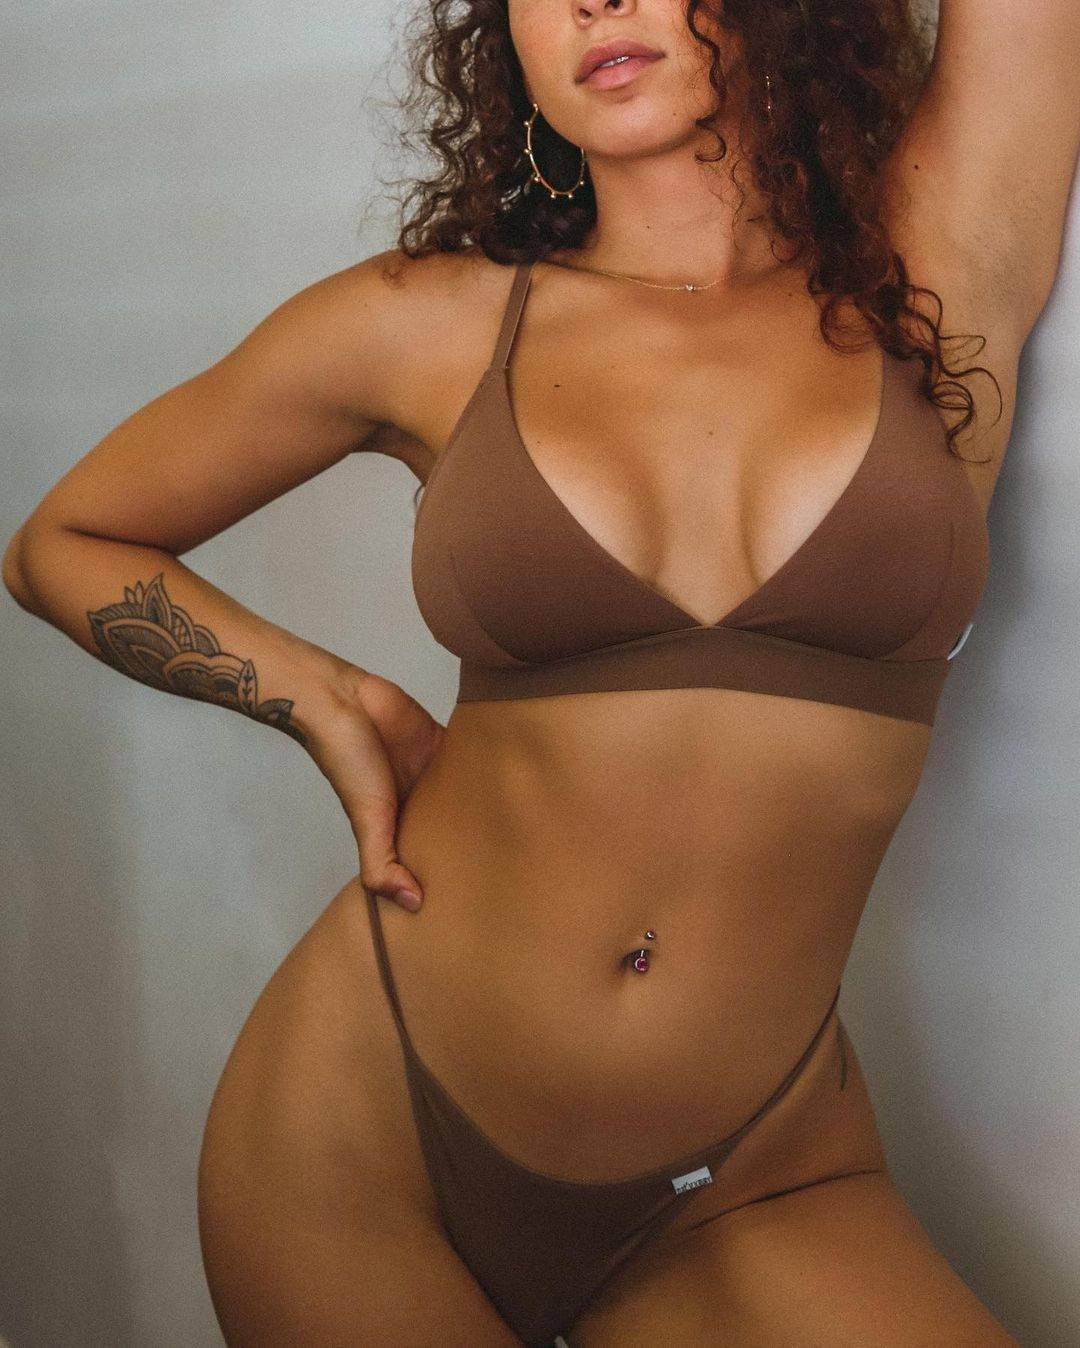 Эскорт модель Айла